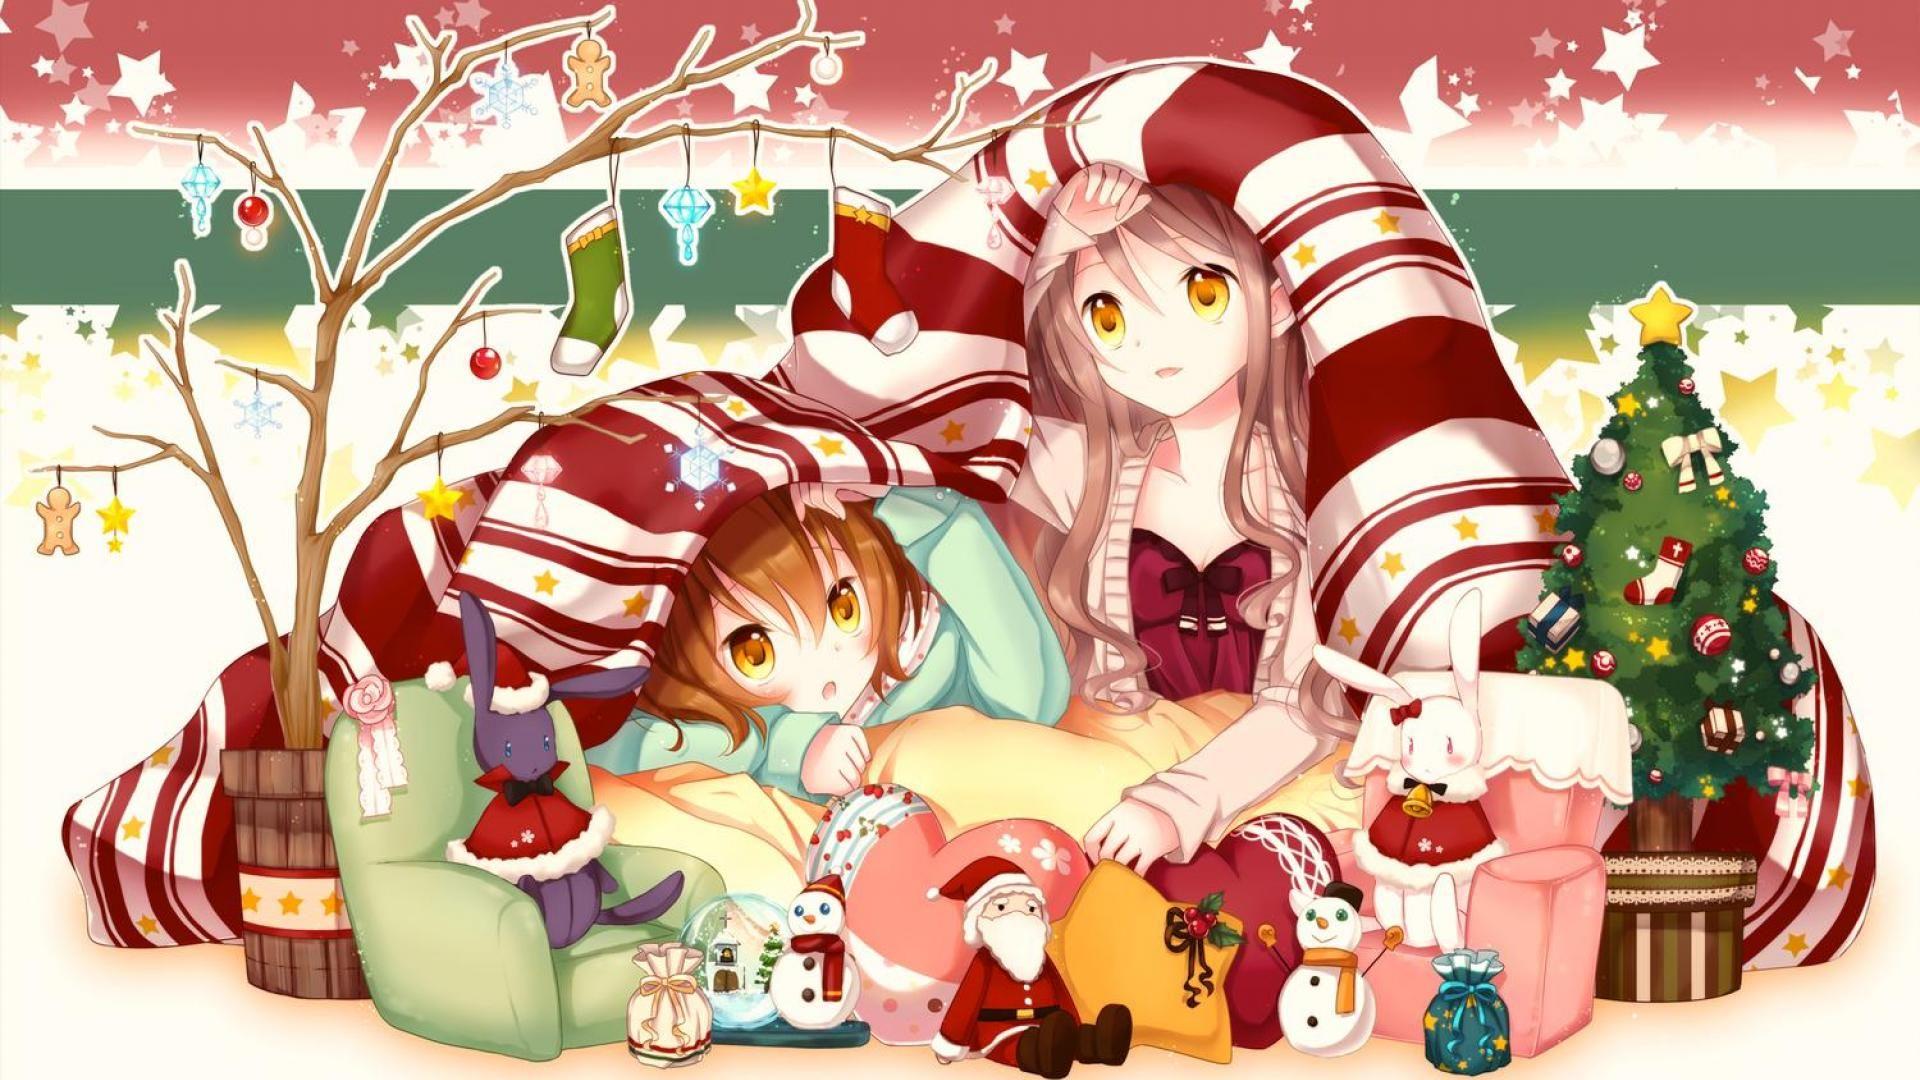 Cute Anime Merry Christmas Background Wallpapers Christmas Wallpaper Rozhdestvenskie Oboi Devushki Iz Anime Rozhdestvo Cute anime christmas wallpaper